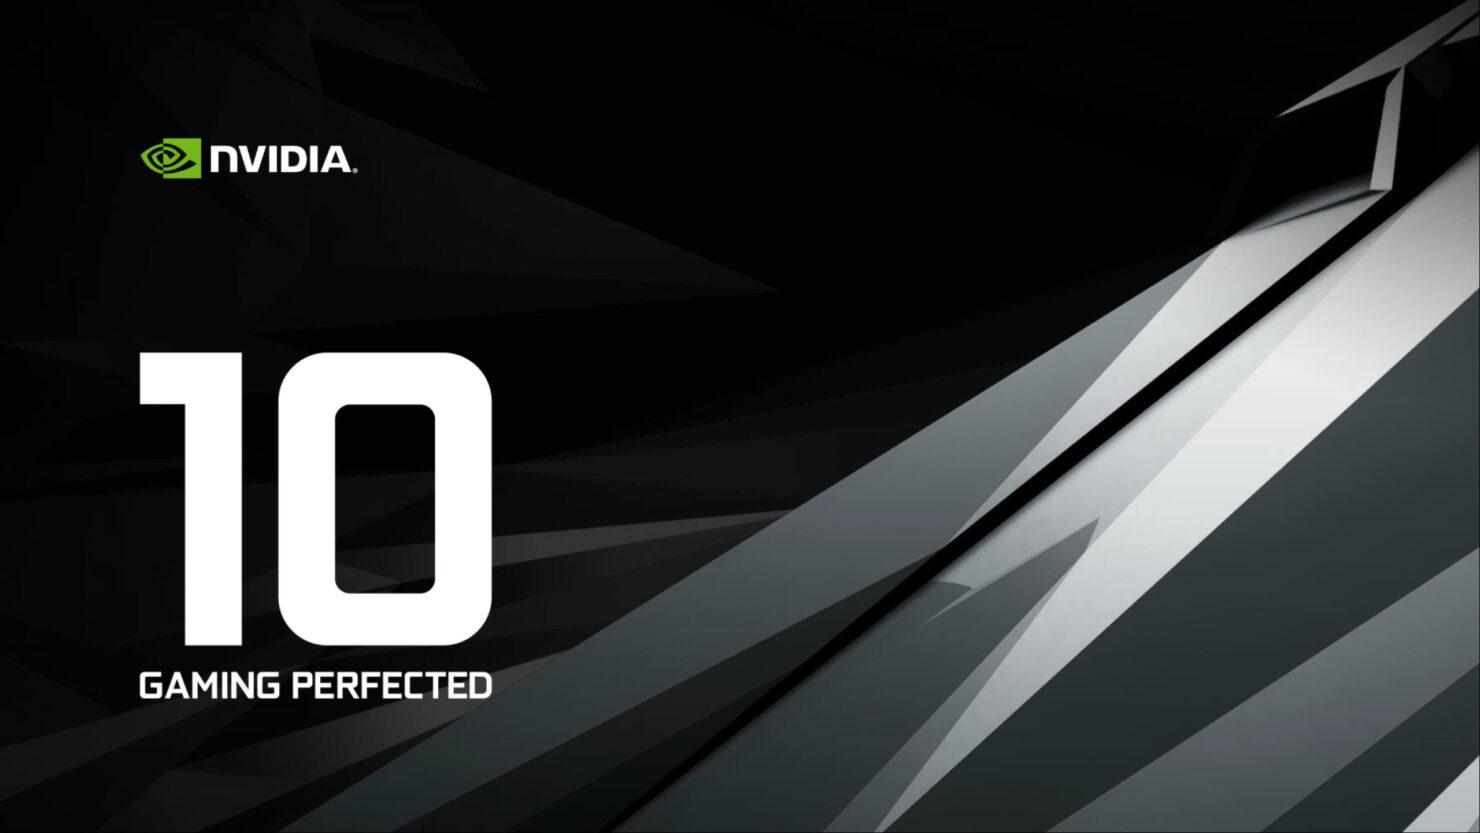 nvidia-geforce-gtx-1060-slide_geforce-10-series